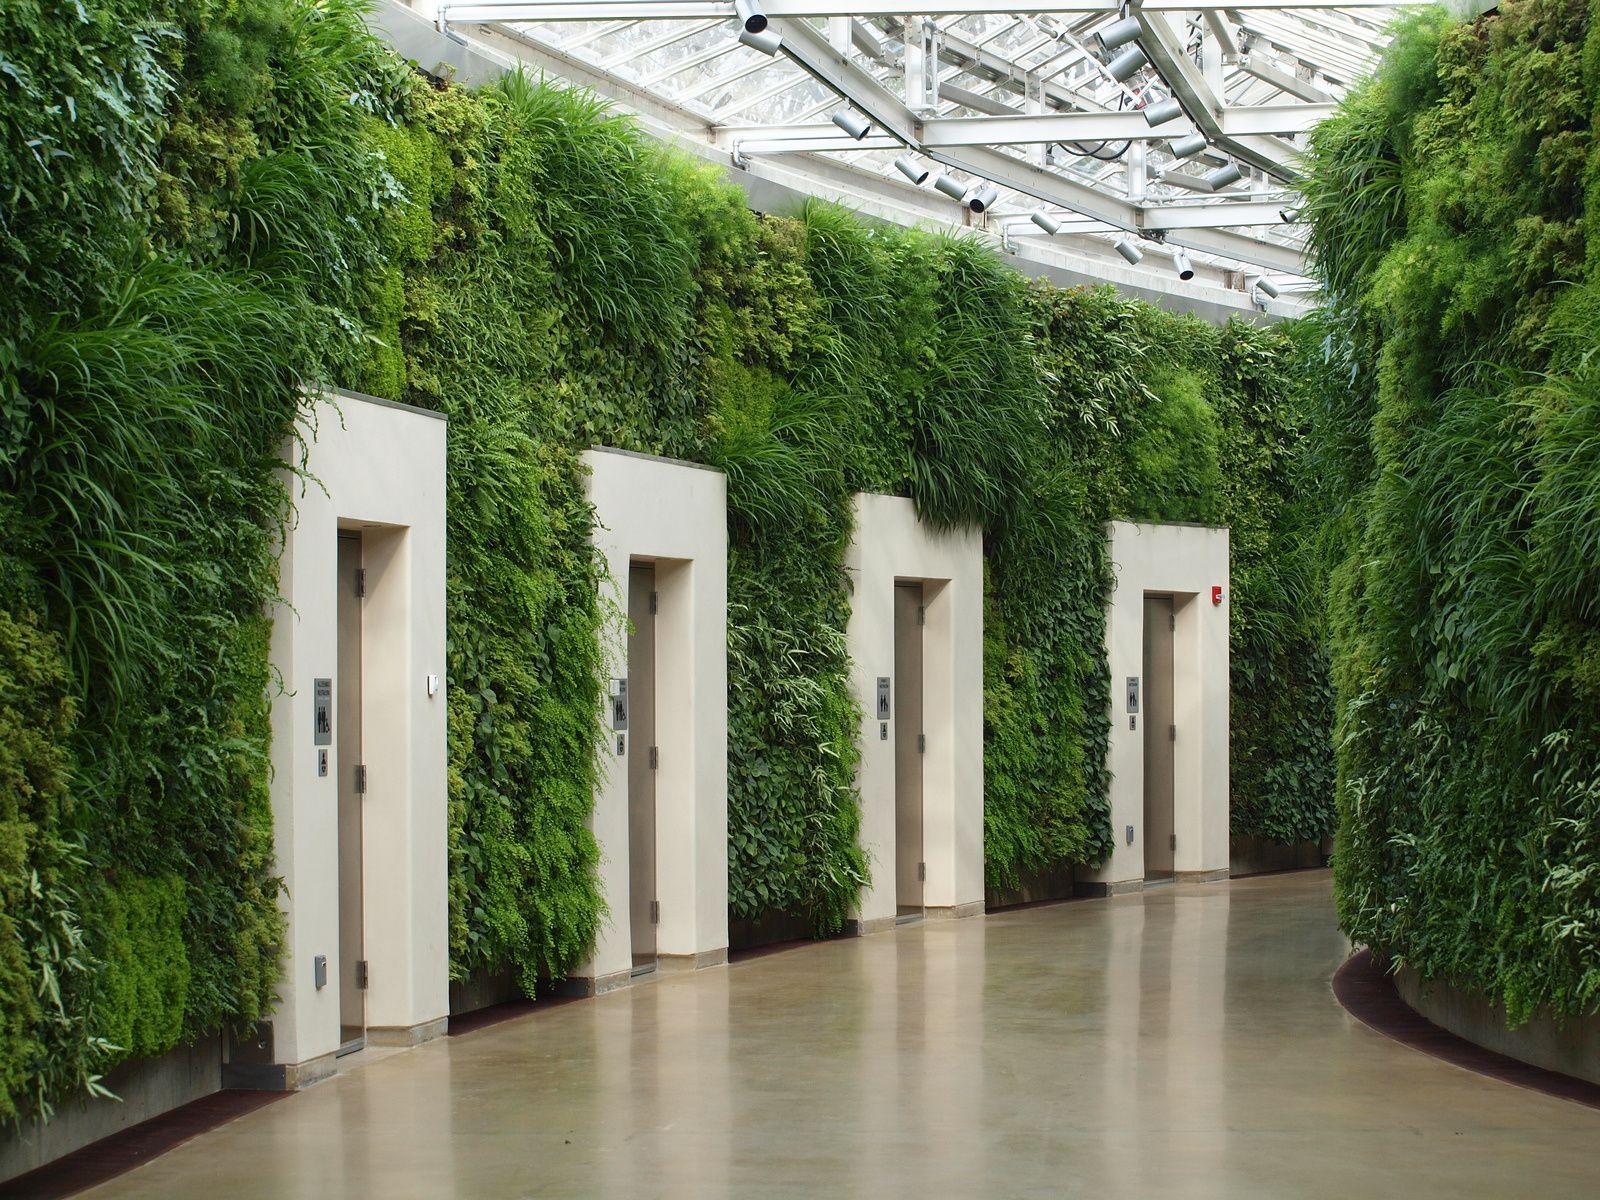 appartements herbacés